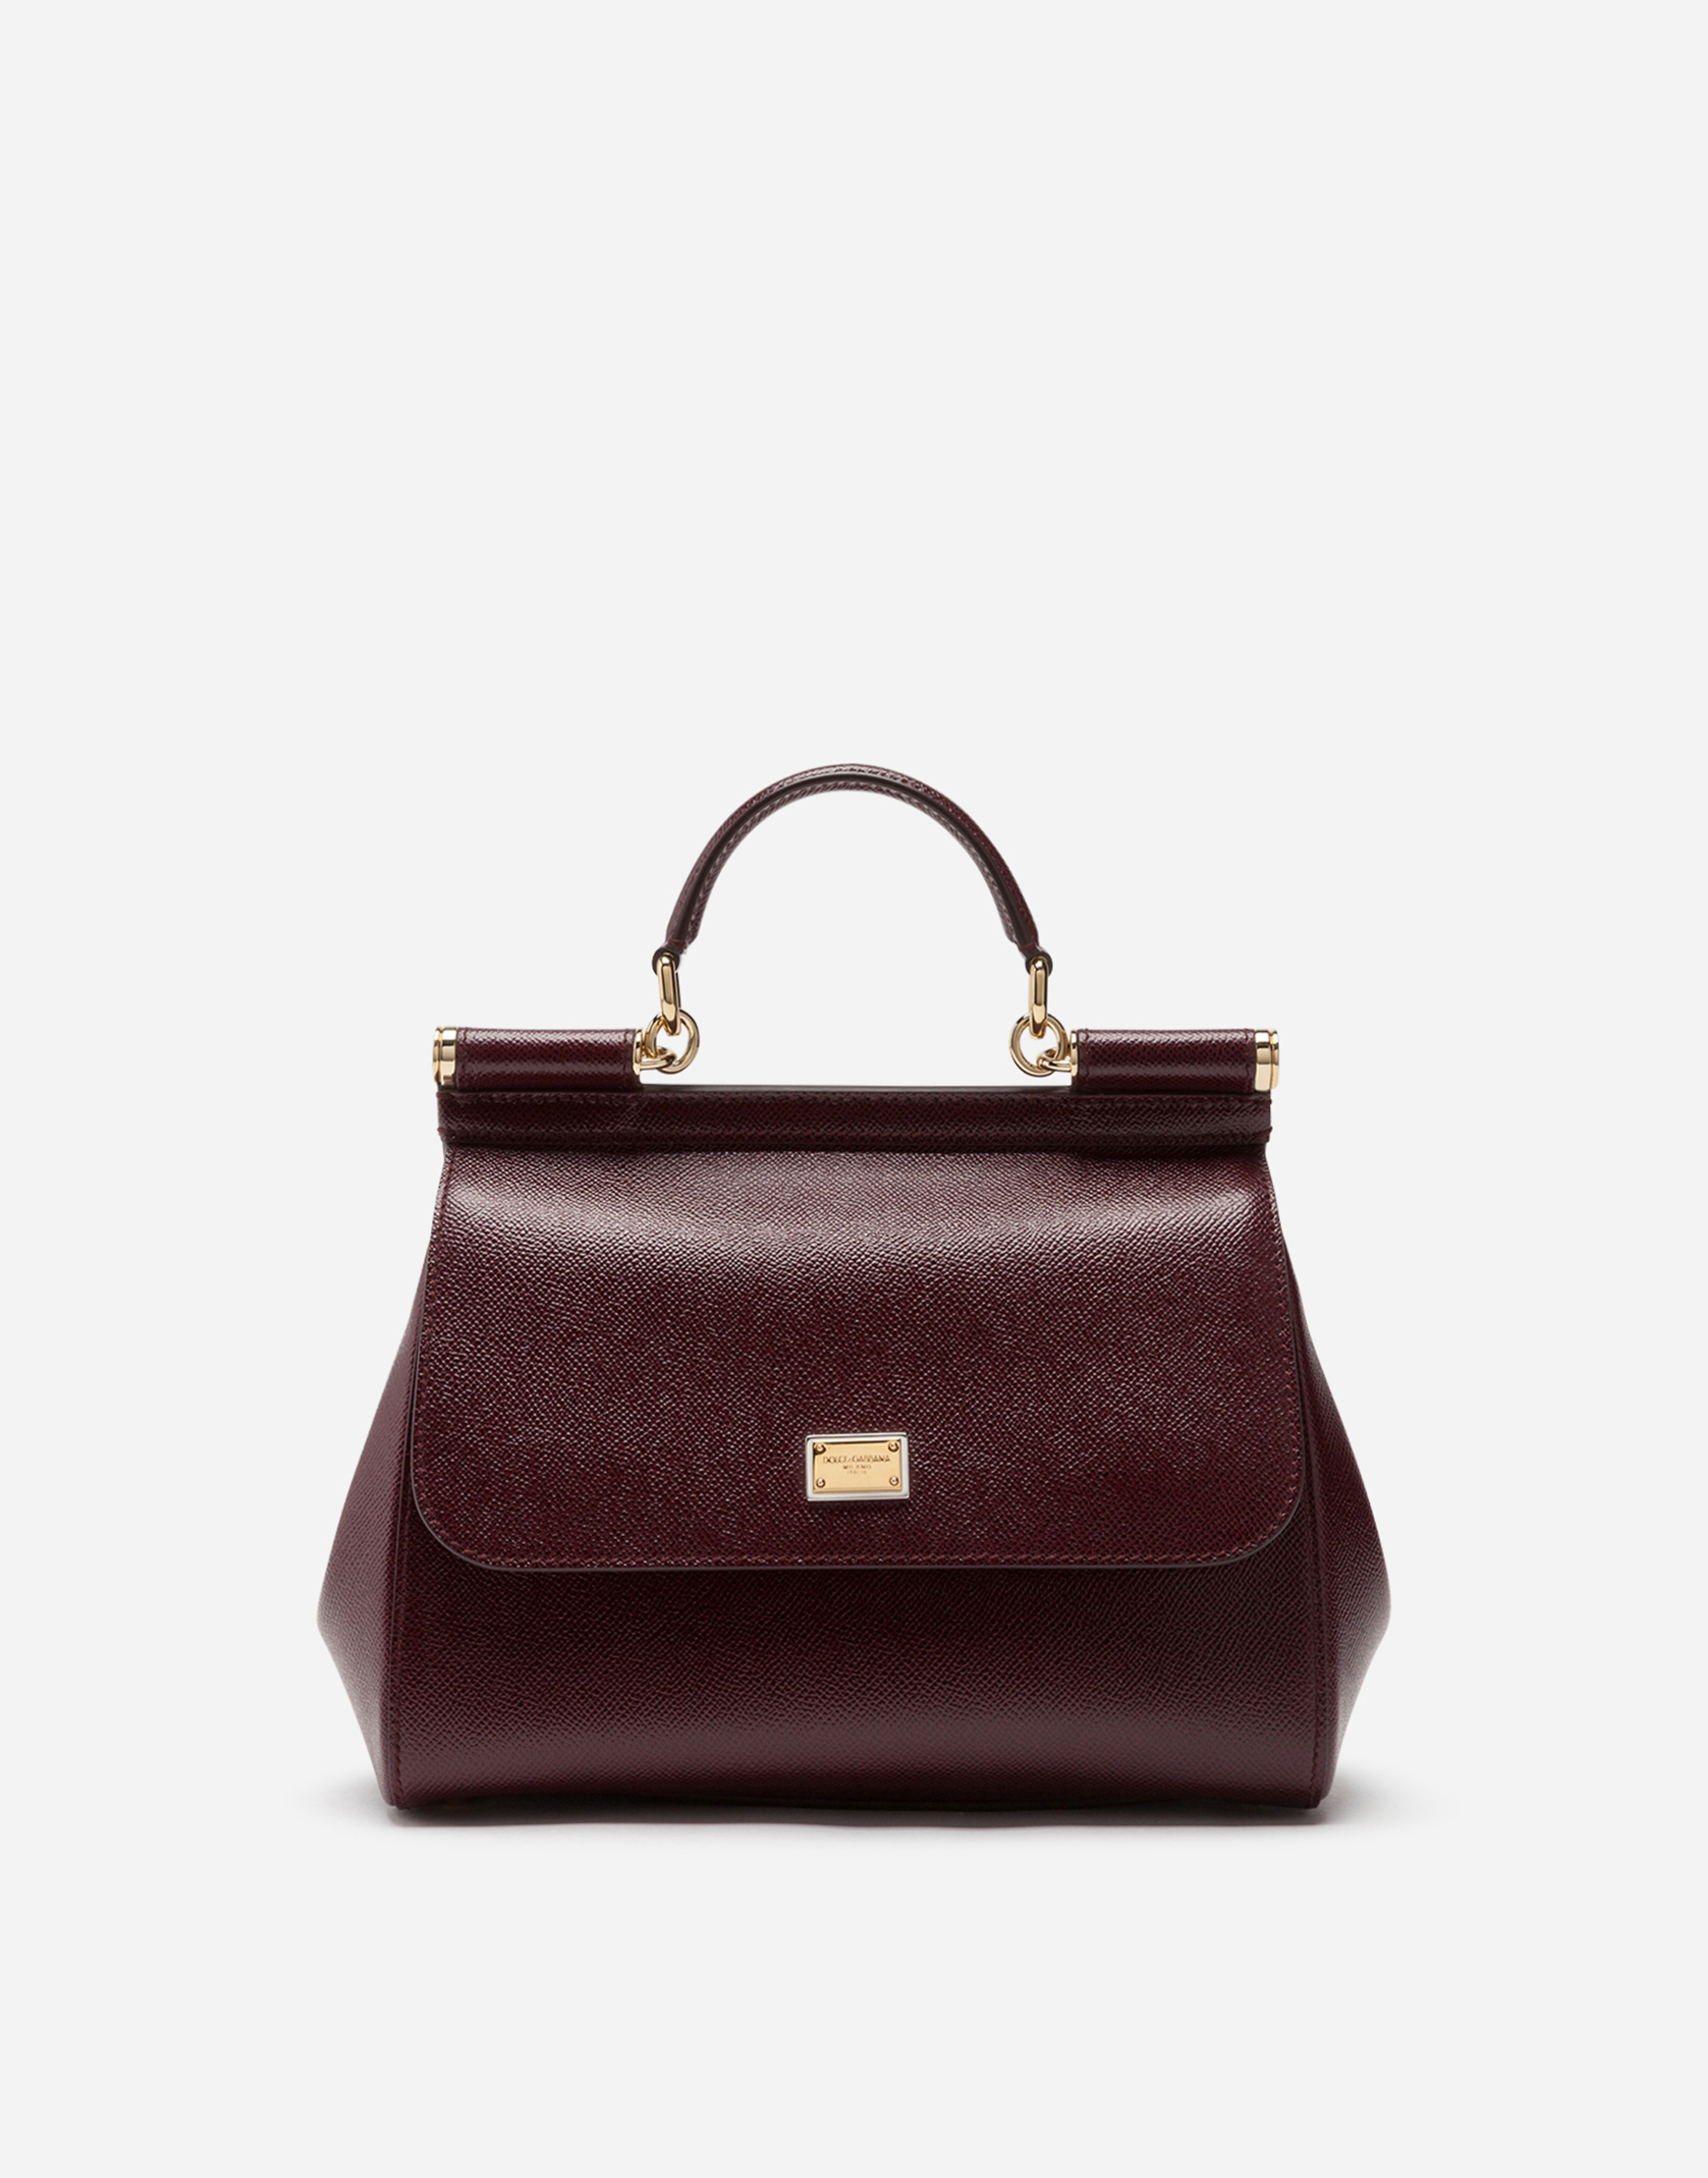 Dolce & Gabbana Medium Dauphine Leather Sicily Bag In Purple